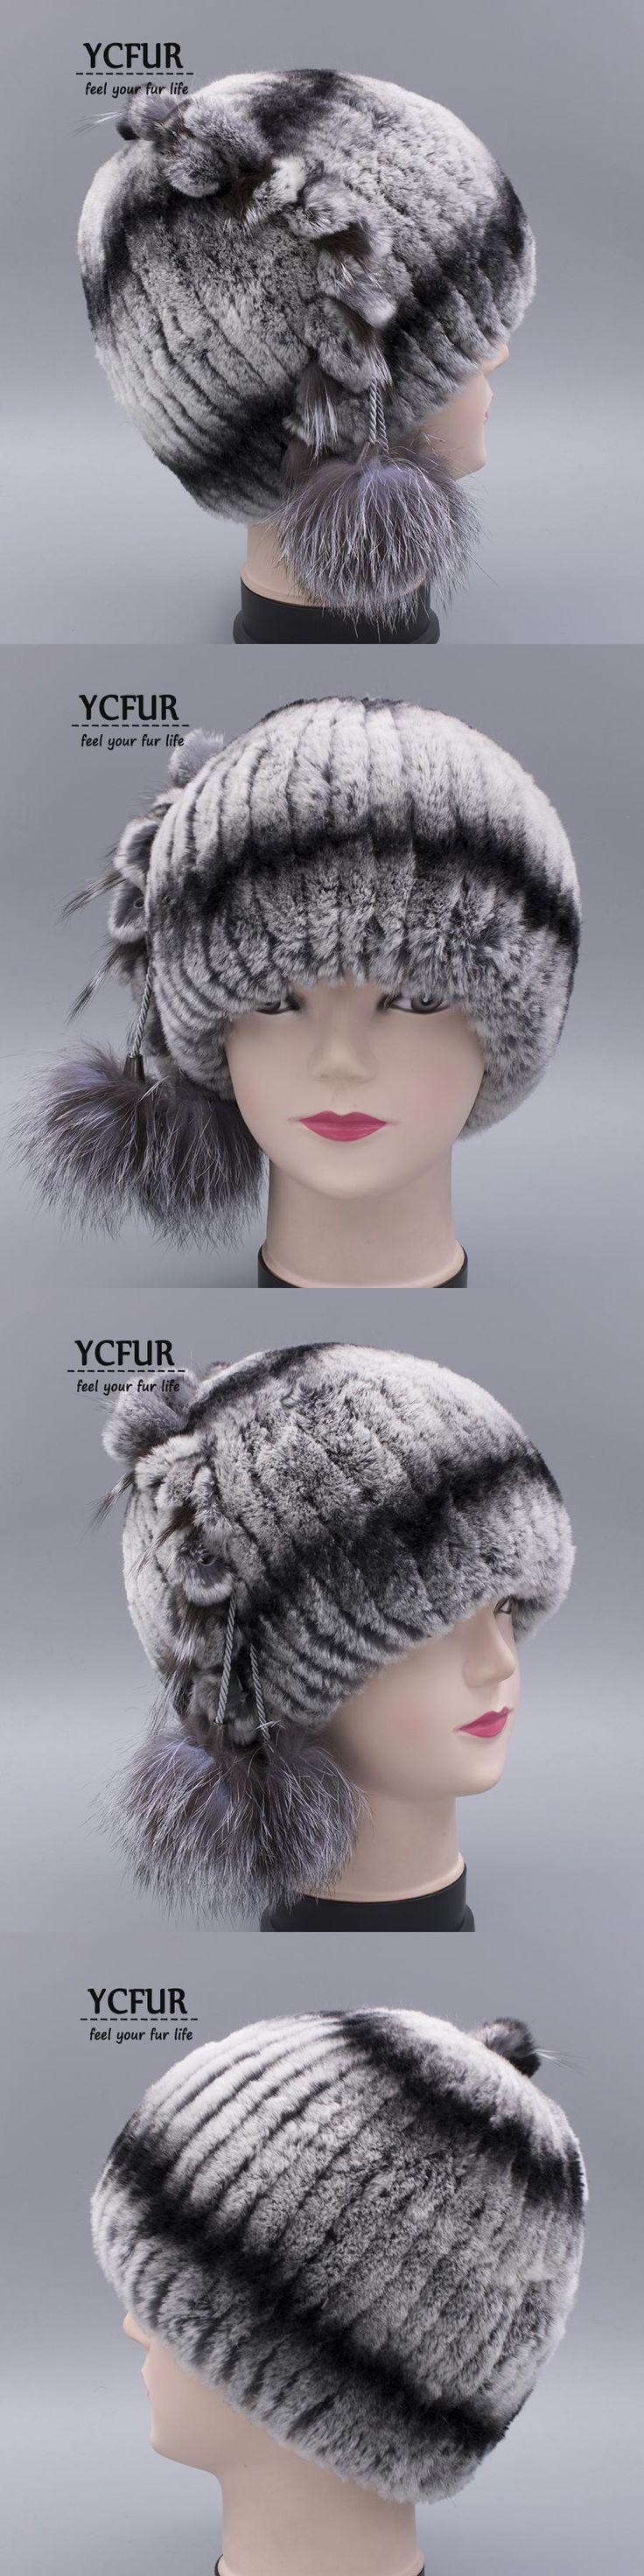 YCFUR Classic Style Hat Women Winter Caps Hats Stripes Rex Rabbit Fur Cap With Silver Fox Fur Trims Pom Beanie Hat chapeu